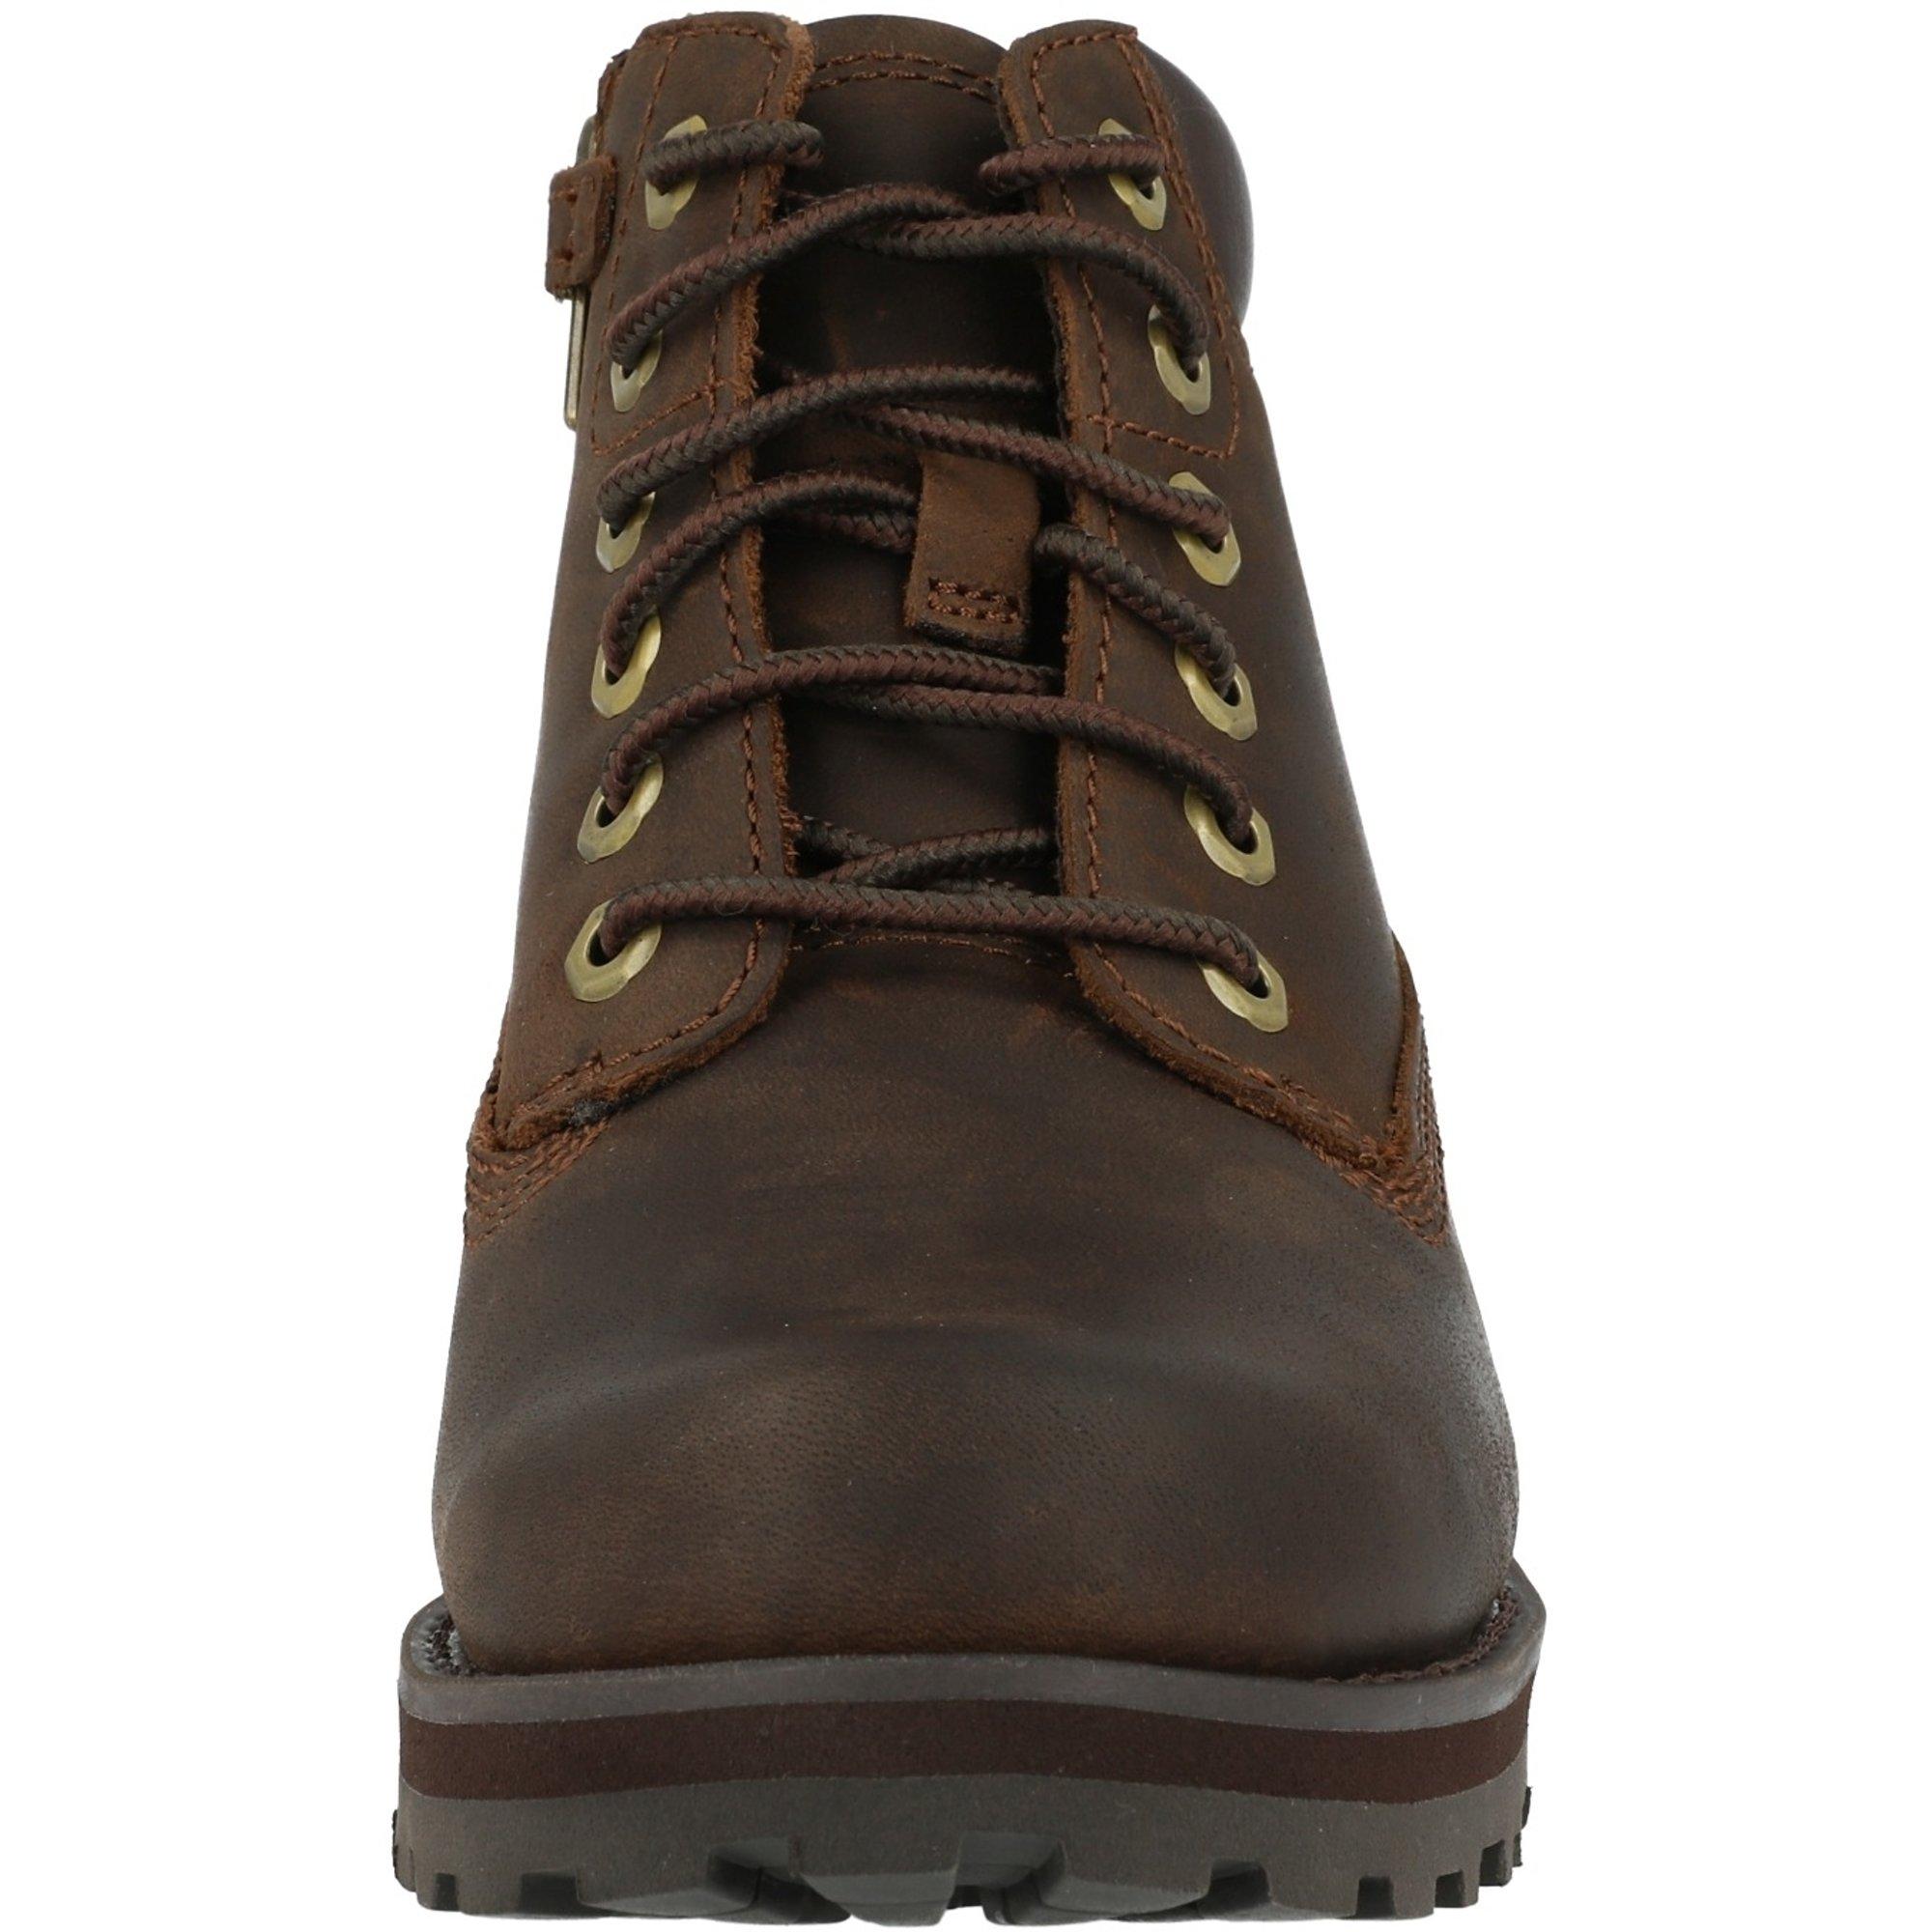 Timberland Courma Kid 6 Inch Side Zip Y Dark Brown Full Grain Leather